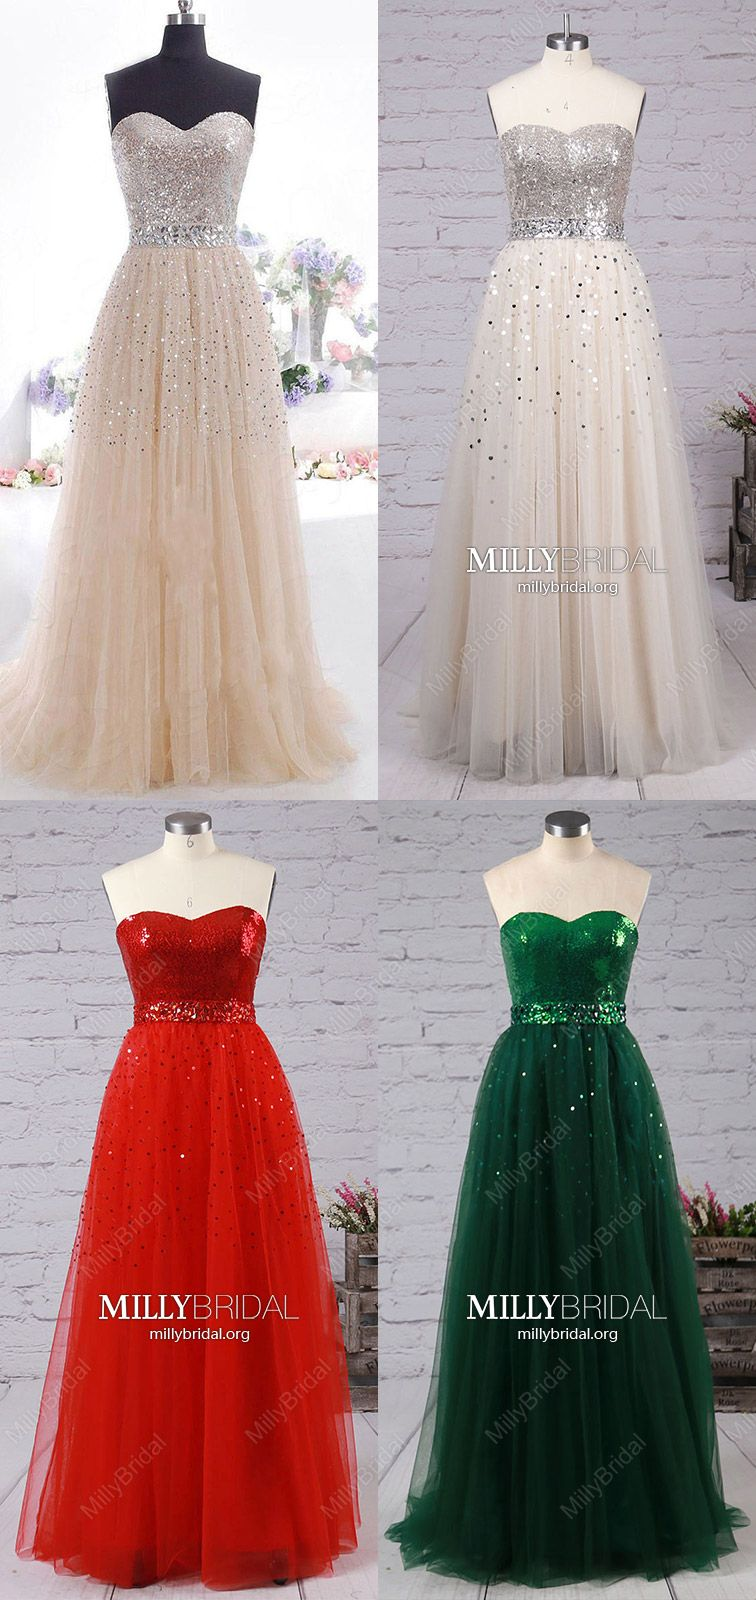 Long prom dresses for teenschampagne formal evening dresses modest